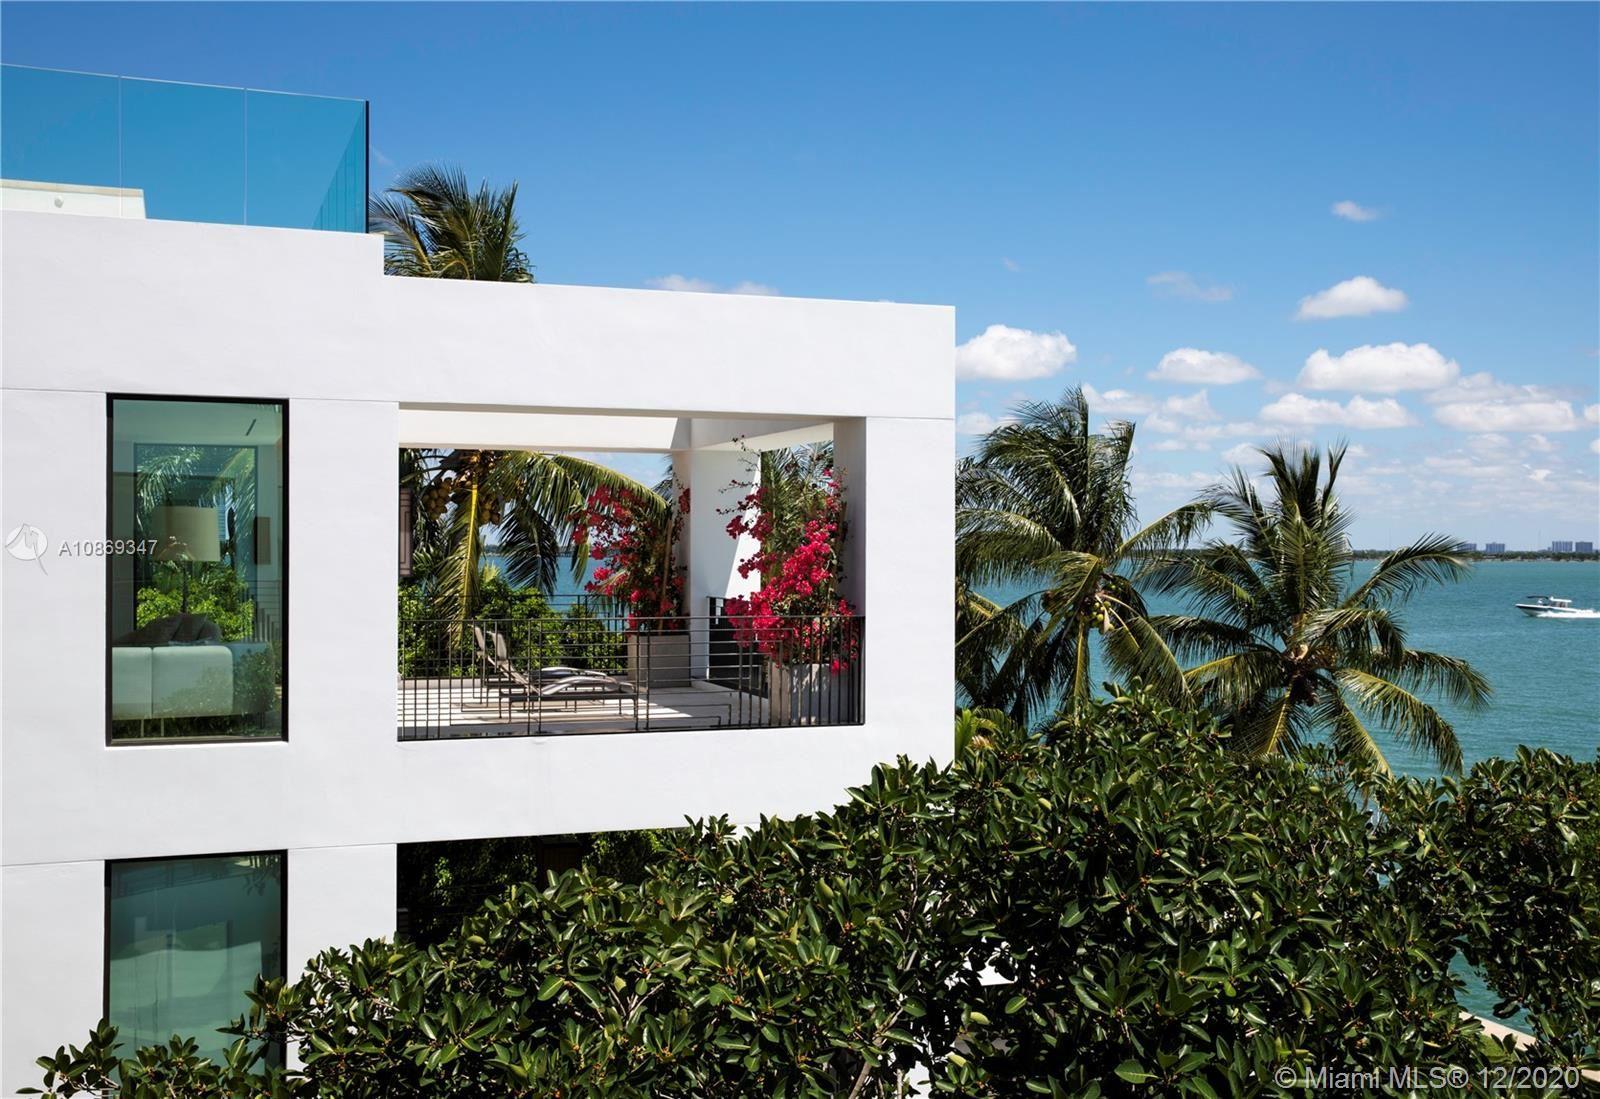 Photo 5 of Listing MLS a10869347 in 1429 N Venetian Way Miami FL 33139